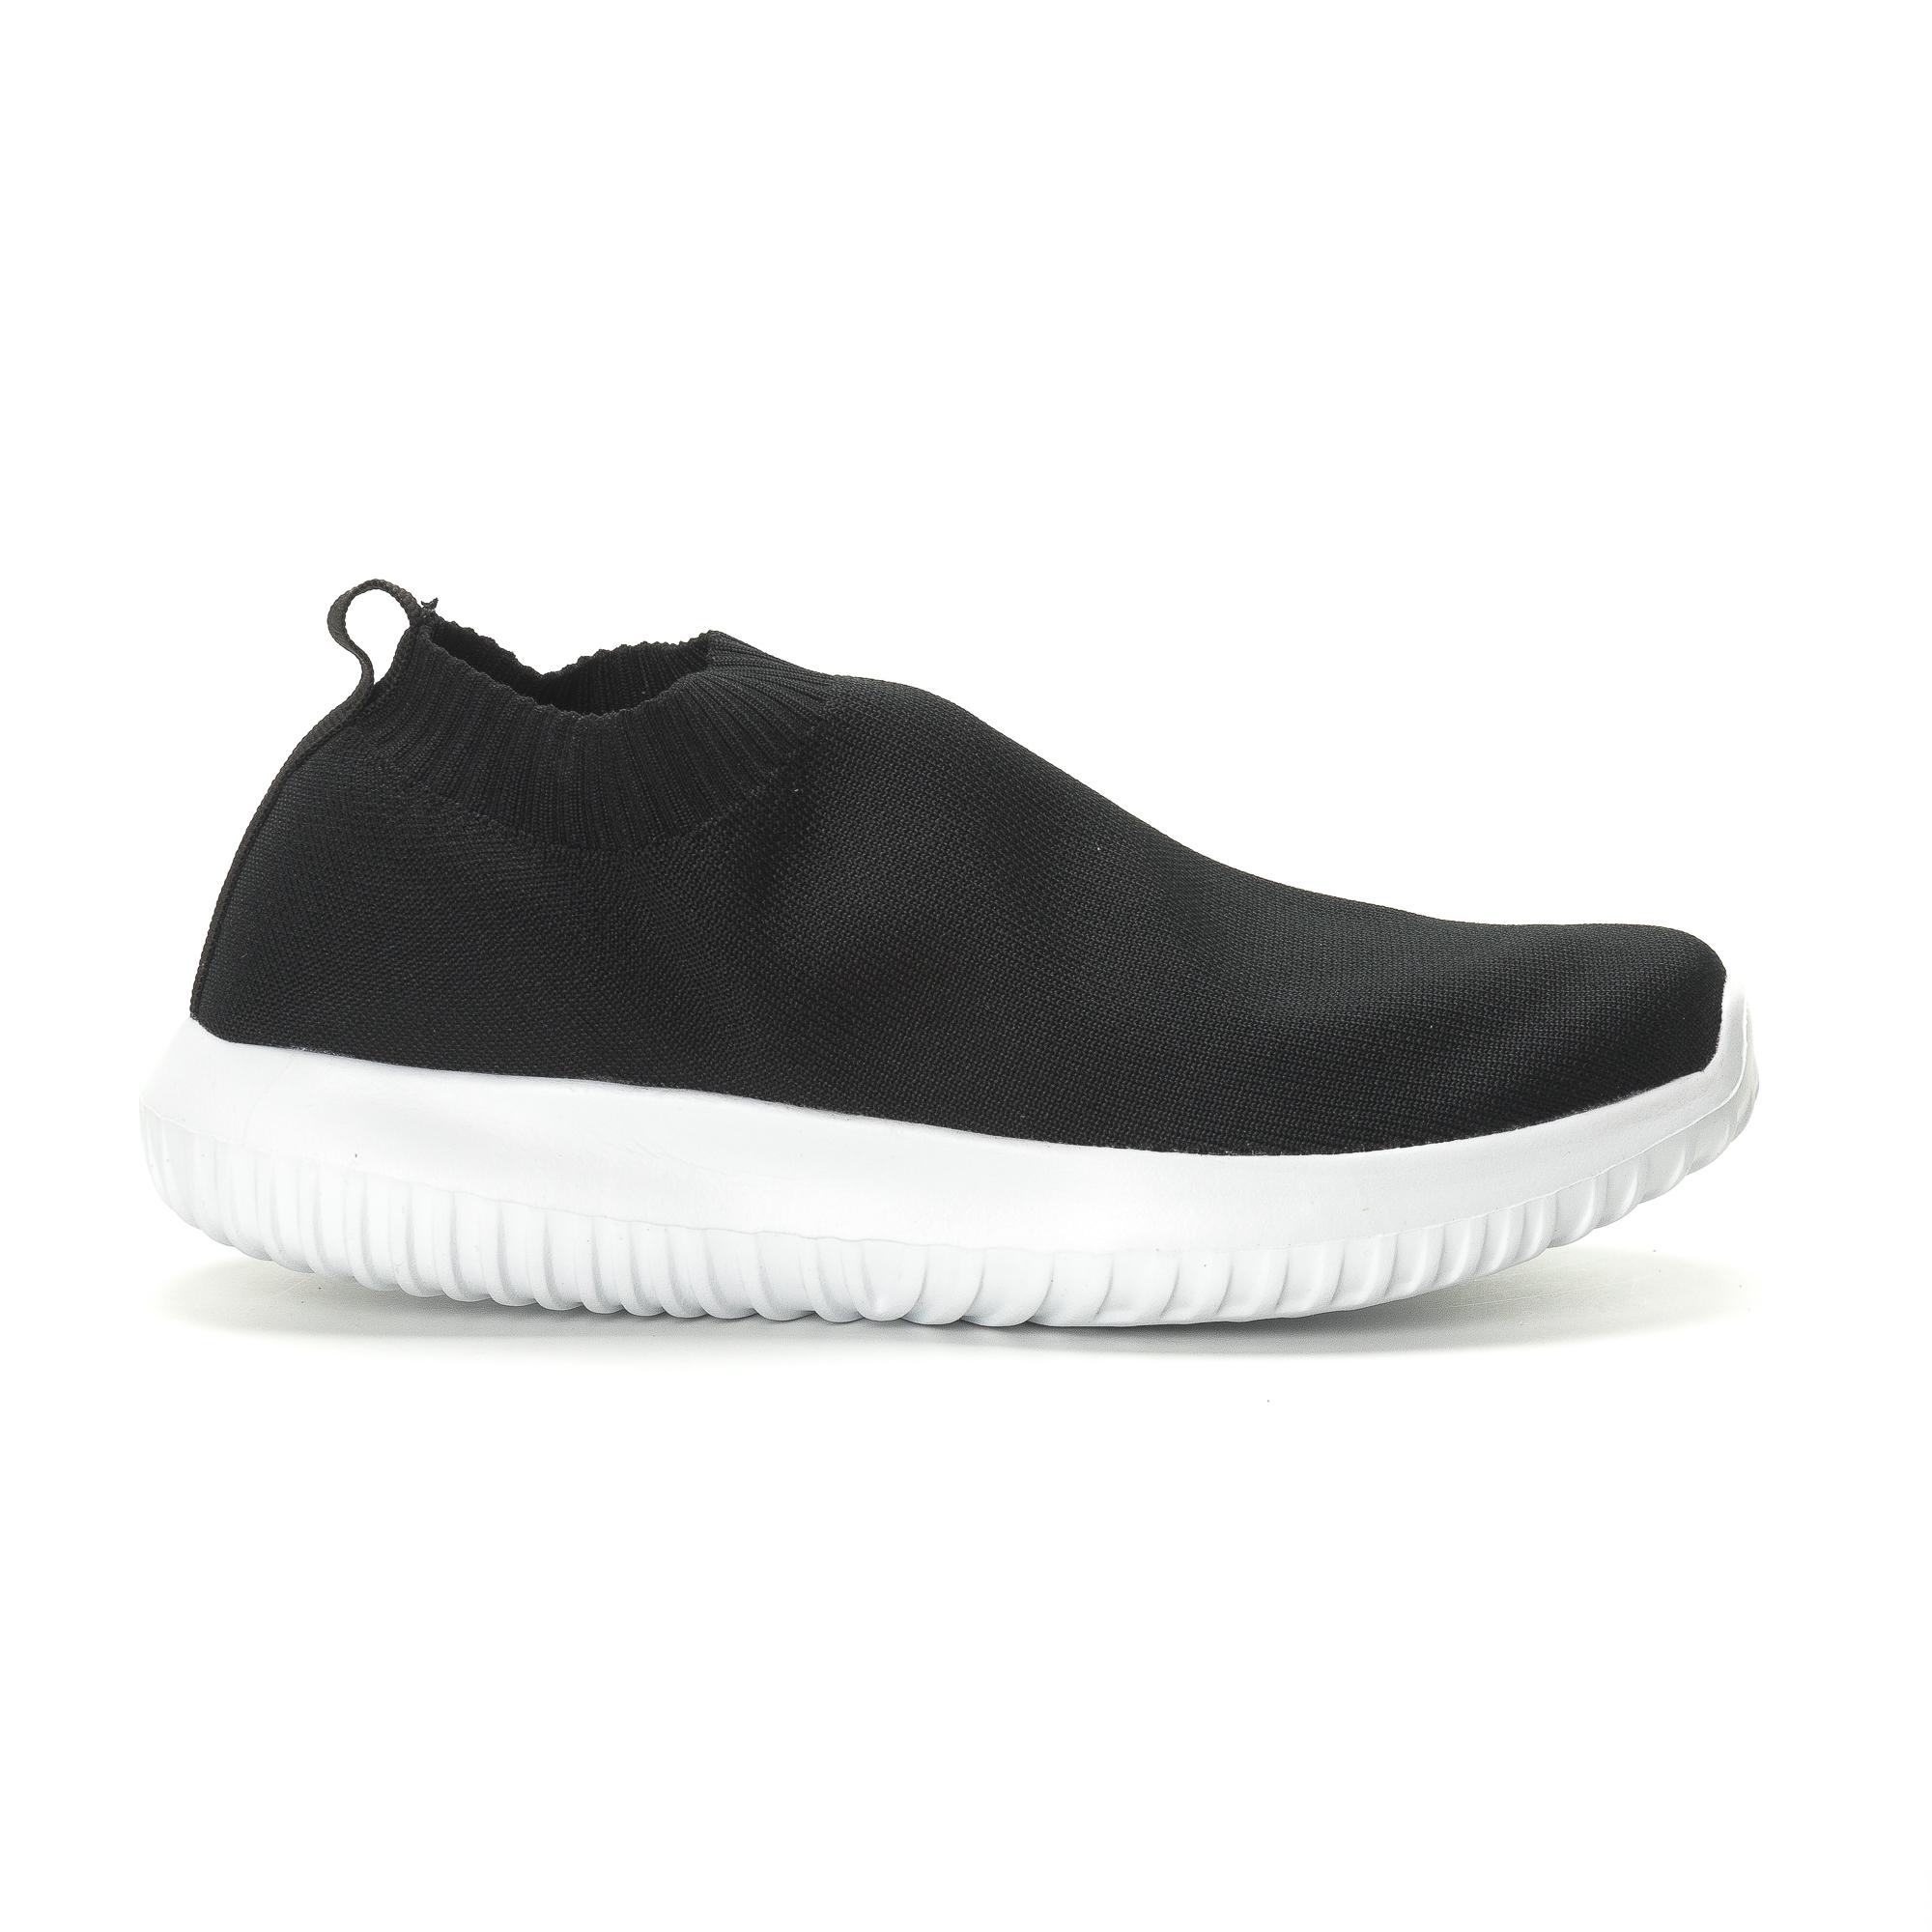 d9f0f982ac3 Ανδρικά χαμηλά μαύρα αθλητικά παπούτσια κάλτσα